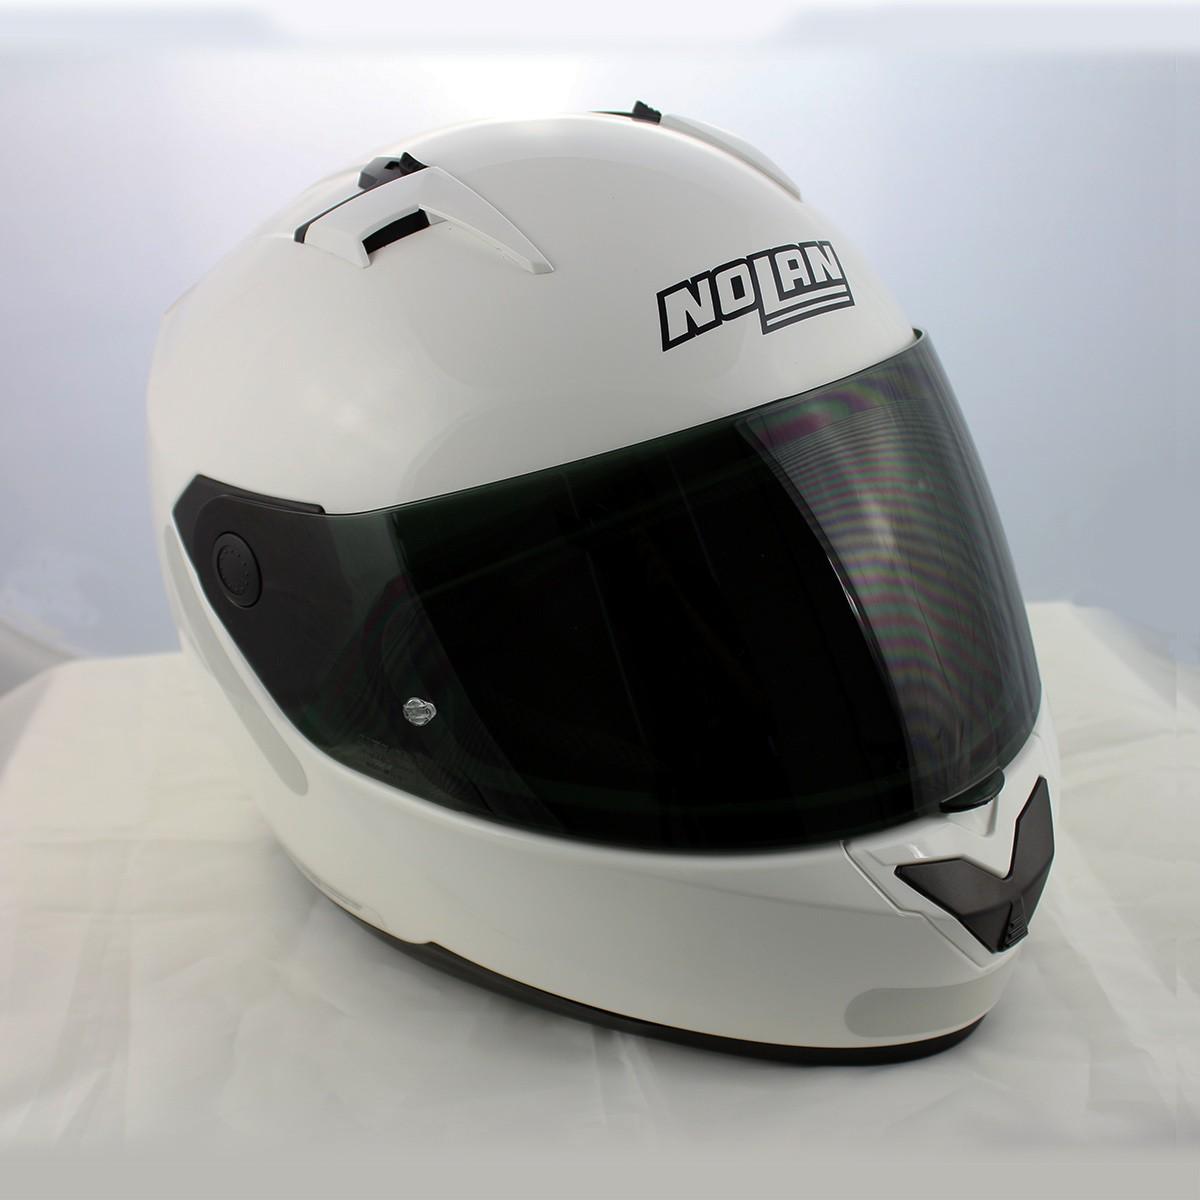 Capacete Nolan N64 Sport White - Ganhe Balaclava Exclusiva!   - Planet Bike Shop Moto Acessórios